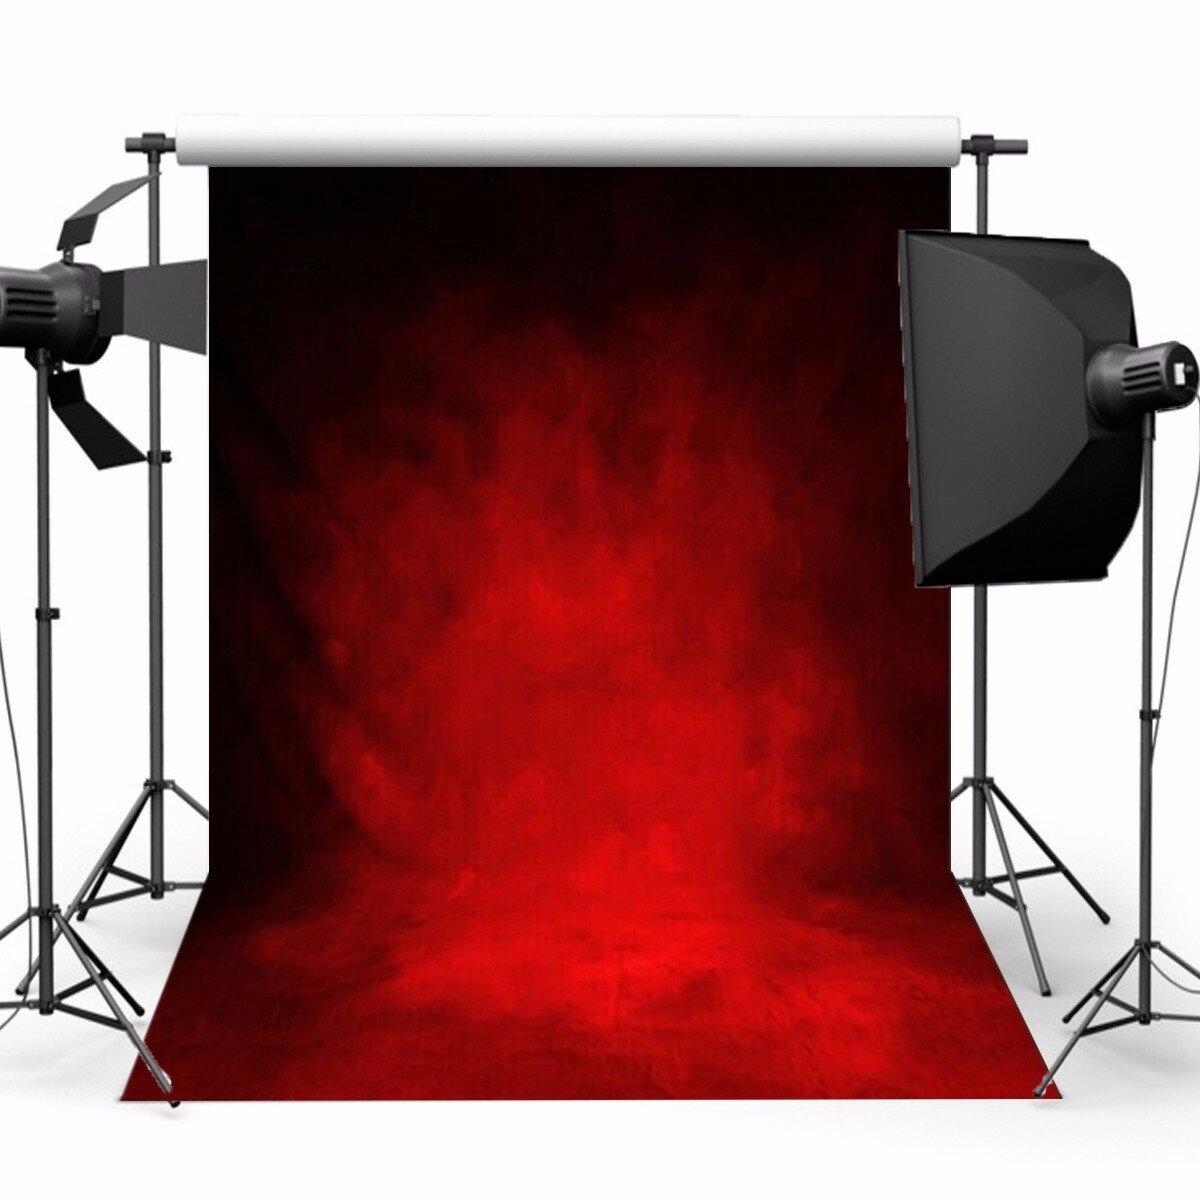 5x7ft Retro Dark Red Theme Photography Vinyl Backdrop Studio Background 2.1m x 1.5m